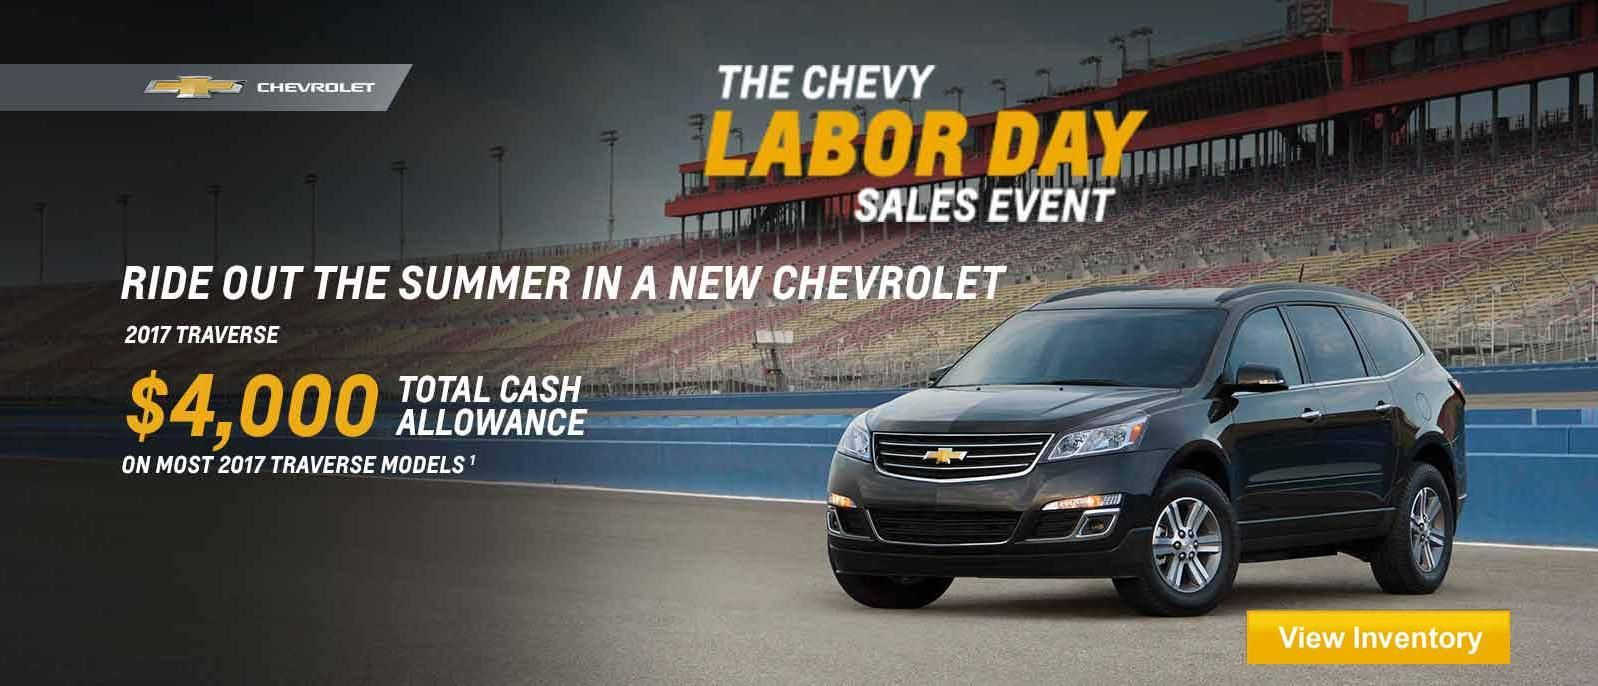 2017 Traverse Chevrolet 2017 Chevy Chevrolet